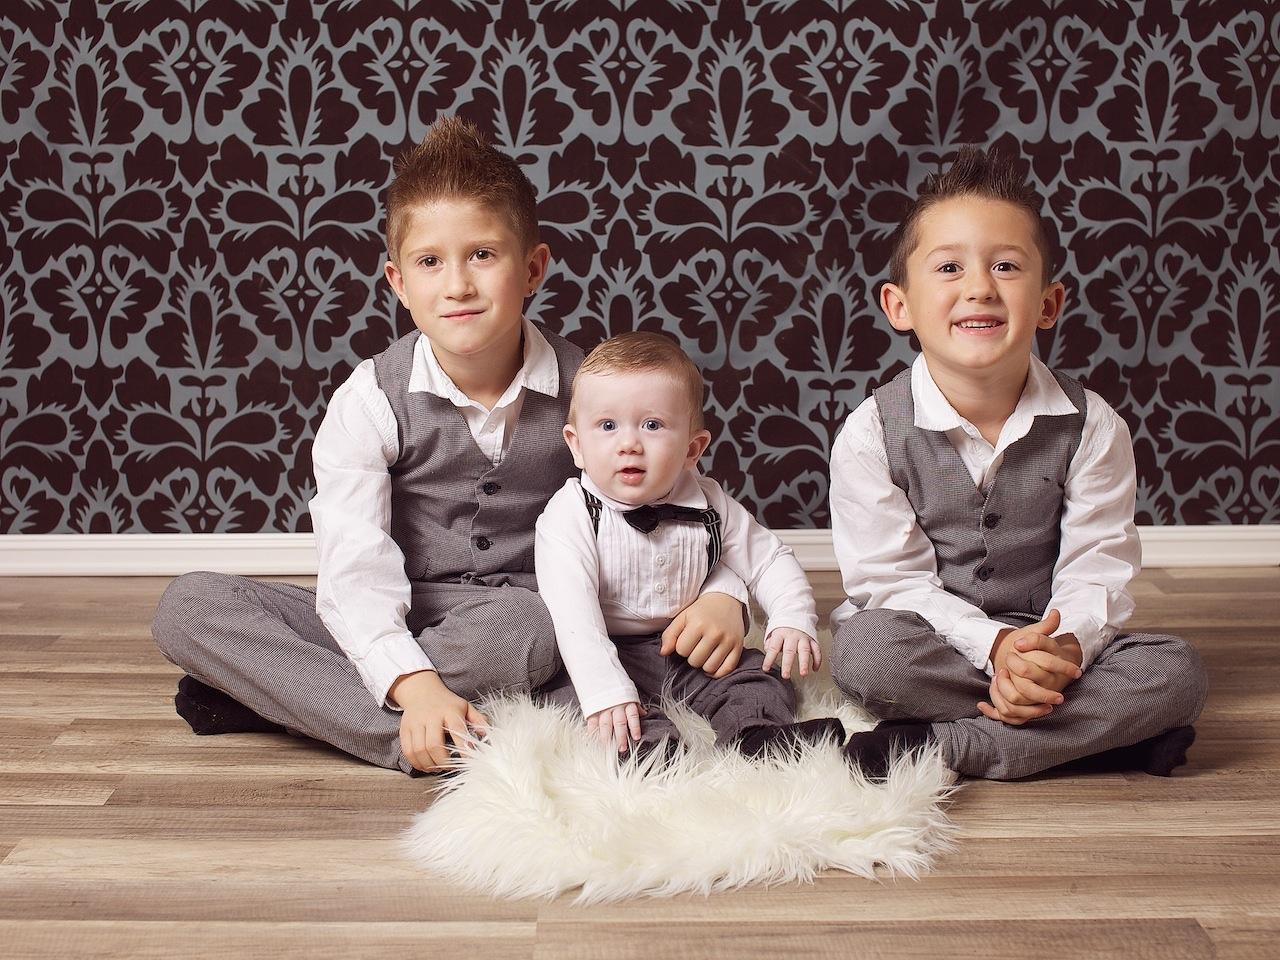 barnefotograf-barnefotografering-baby-barn-fotograf-babyfotograf-søskenfotograf-søskenfotografering